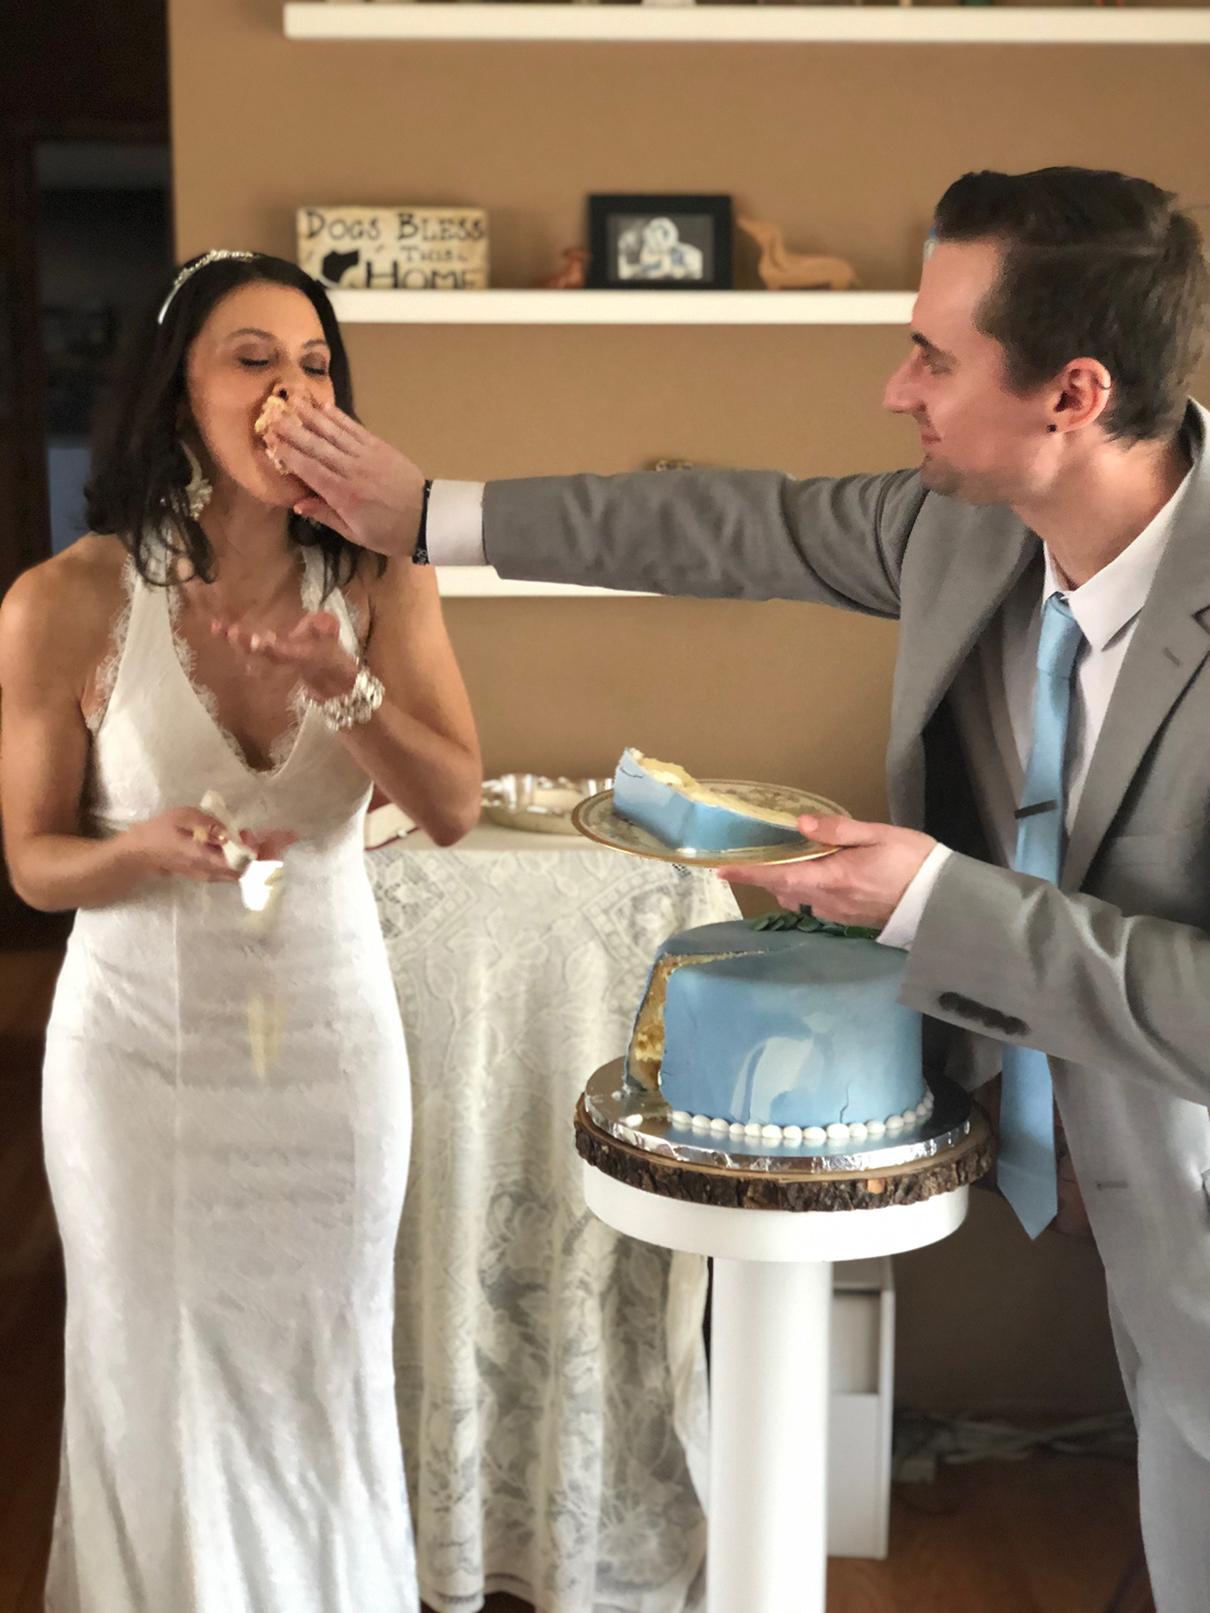 Newlyweds enjoying their first slice of wedding cake.